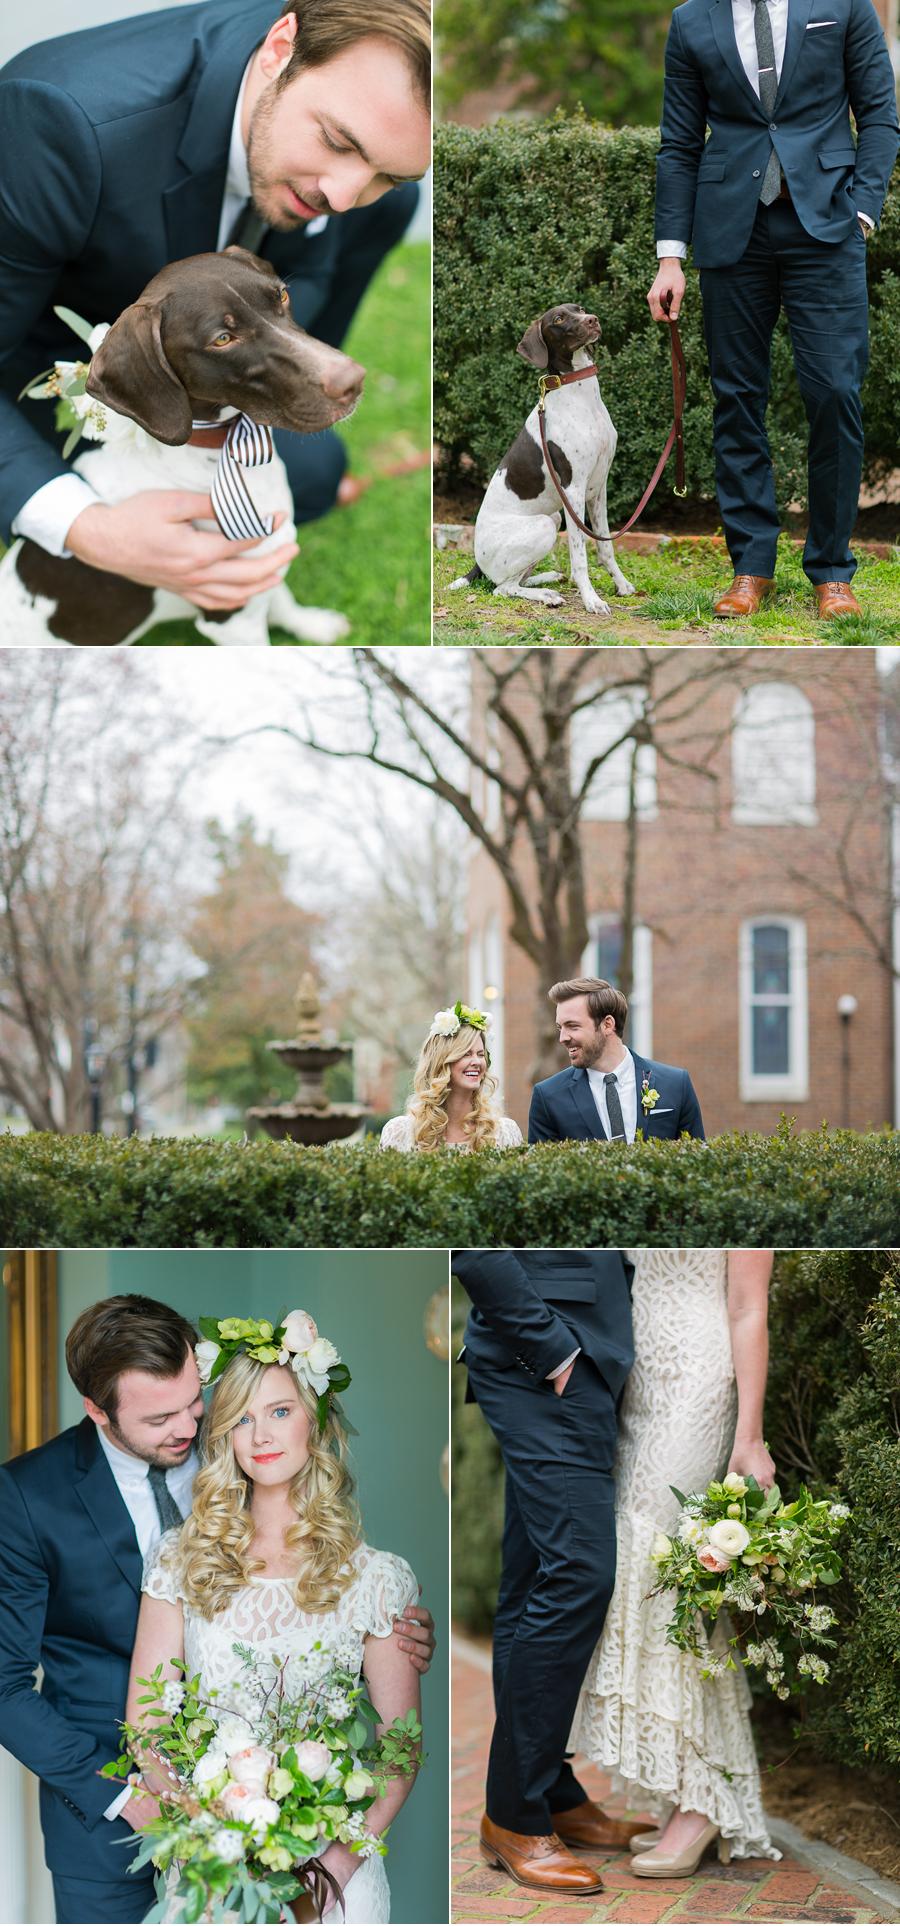 Franklin_TN_Wedding_Photographer_Rachel_Moore_5